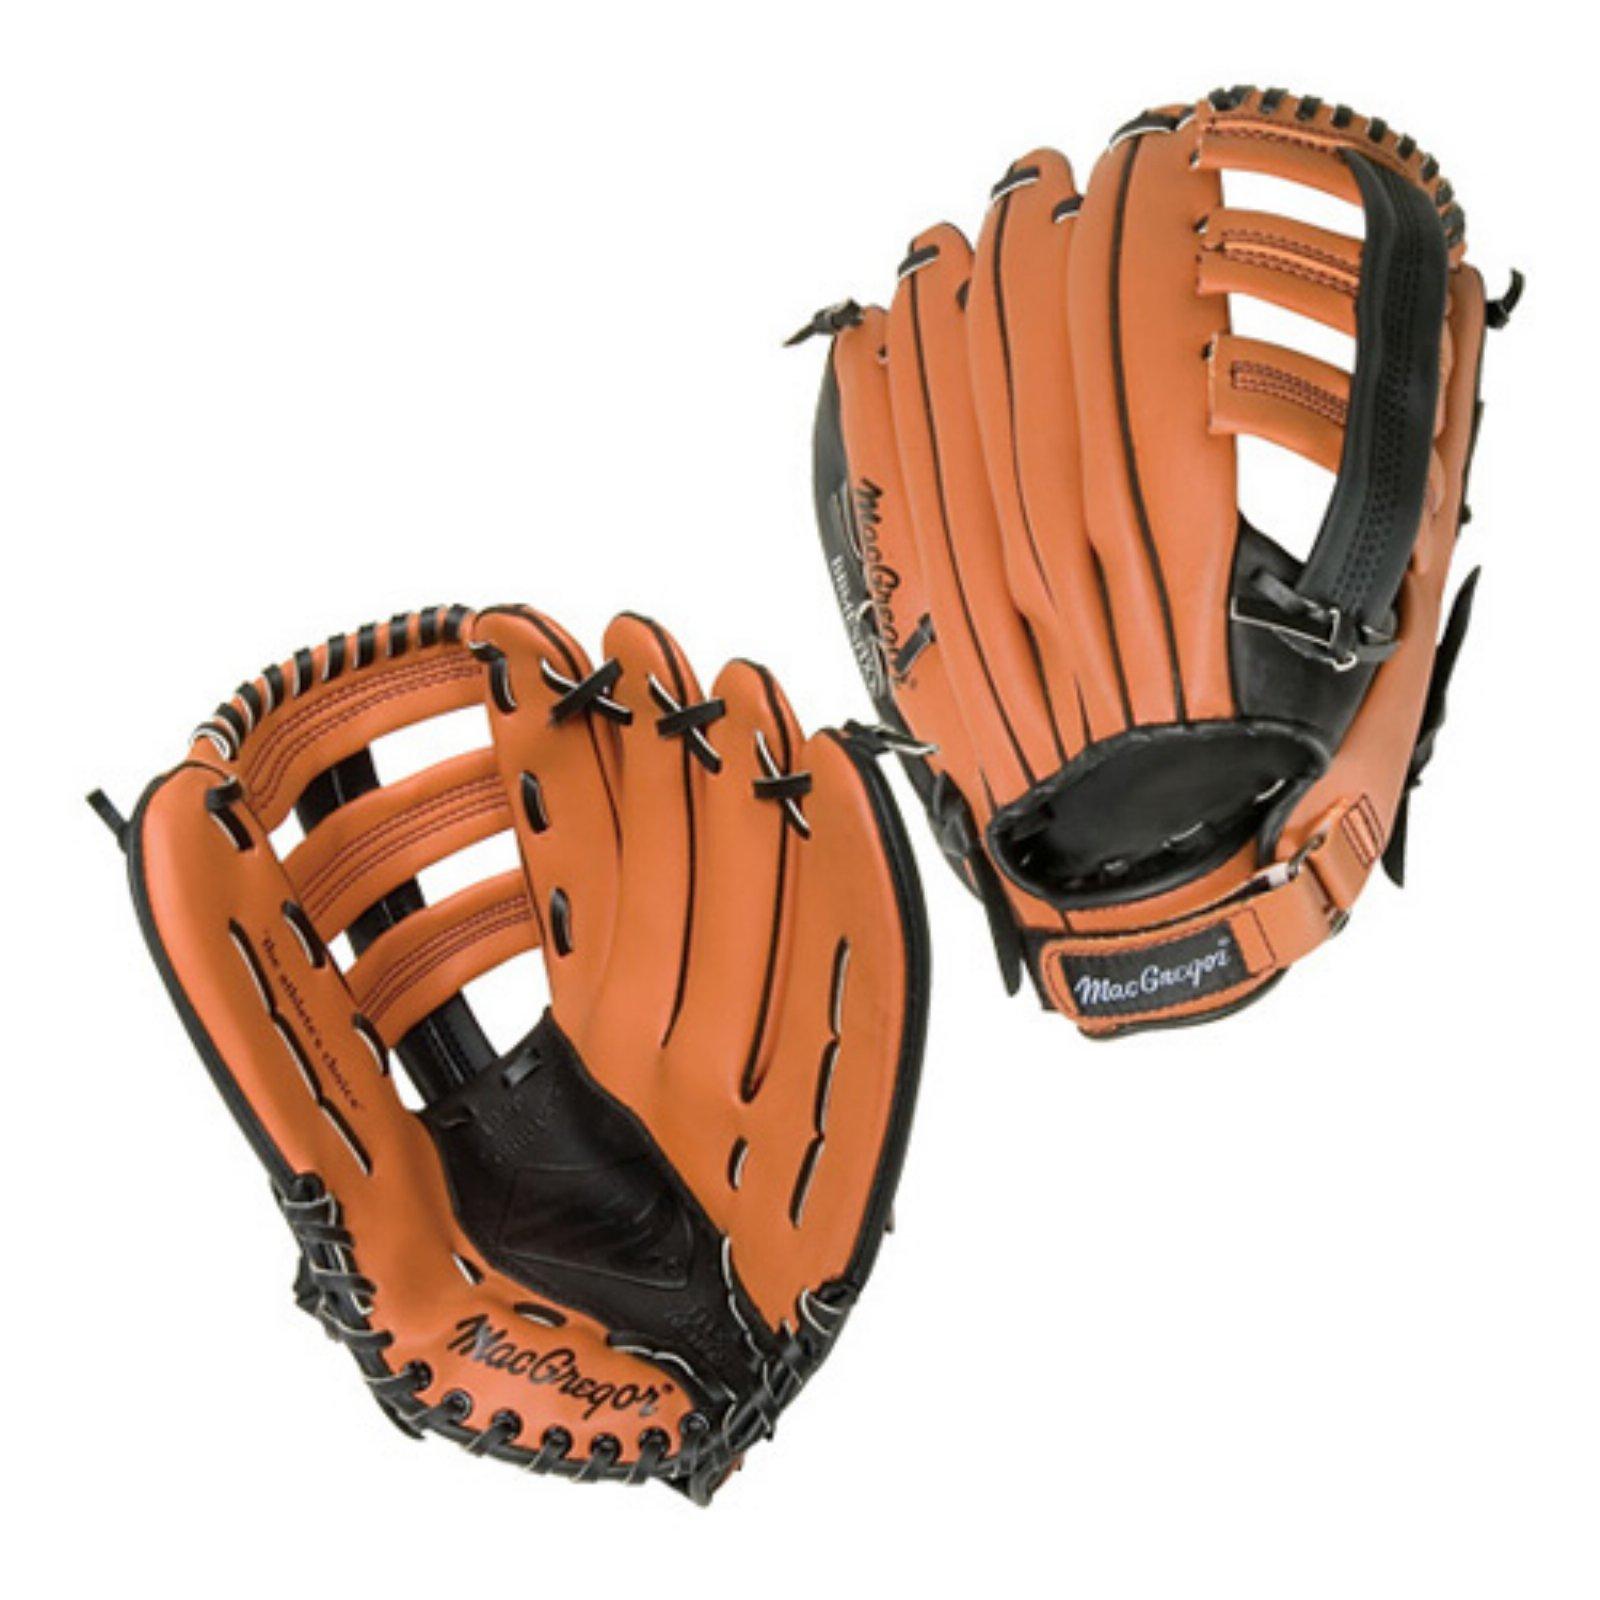 MacGregor BBMESHXX 12.5 in. Fielders Glove Baseball